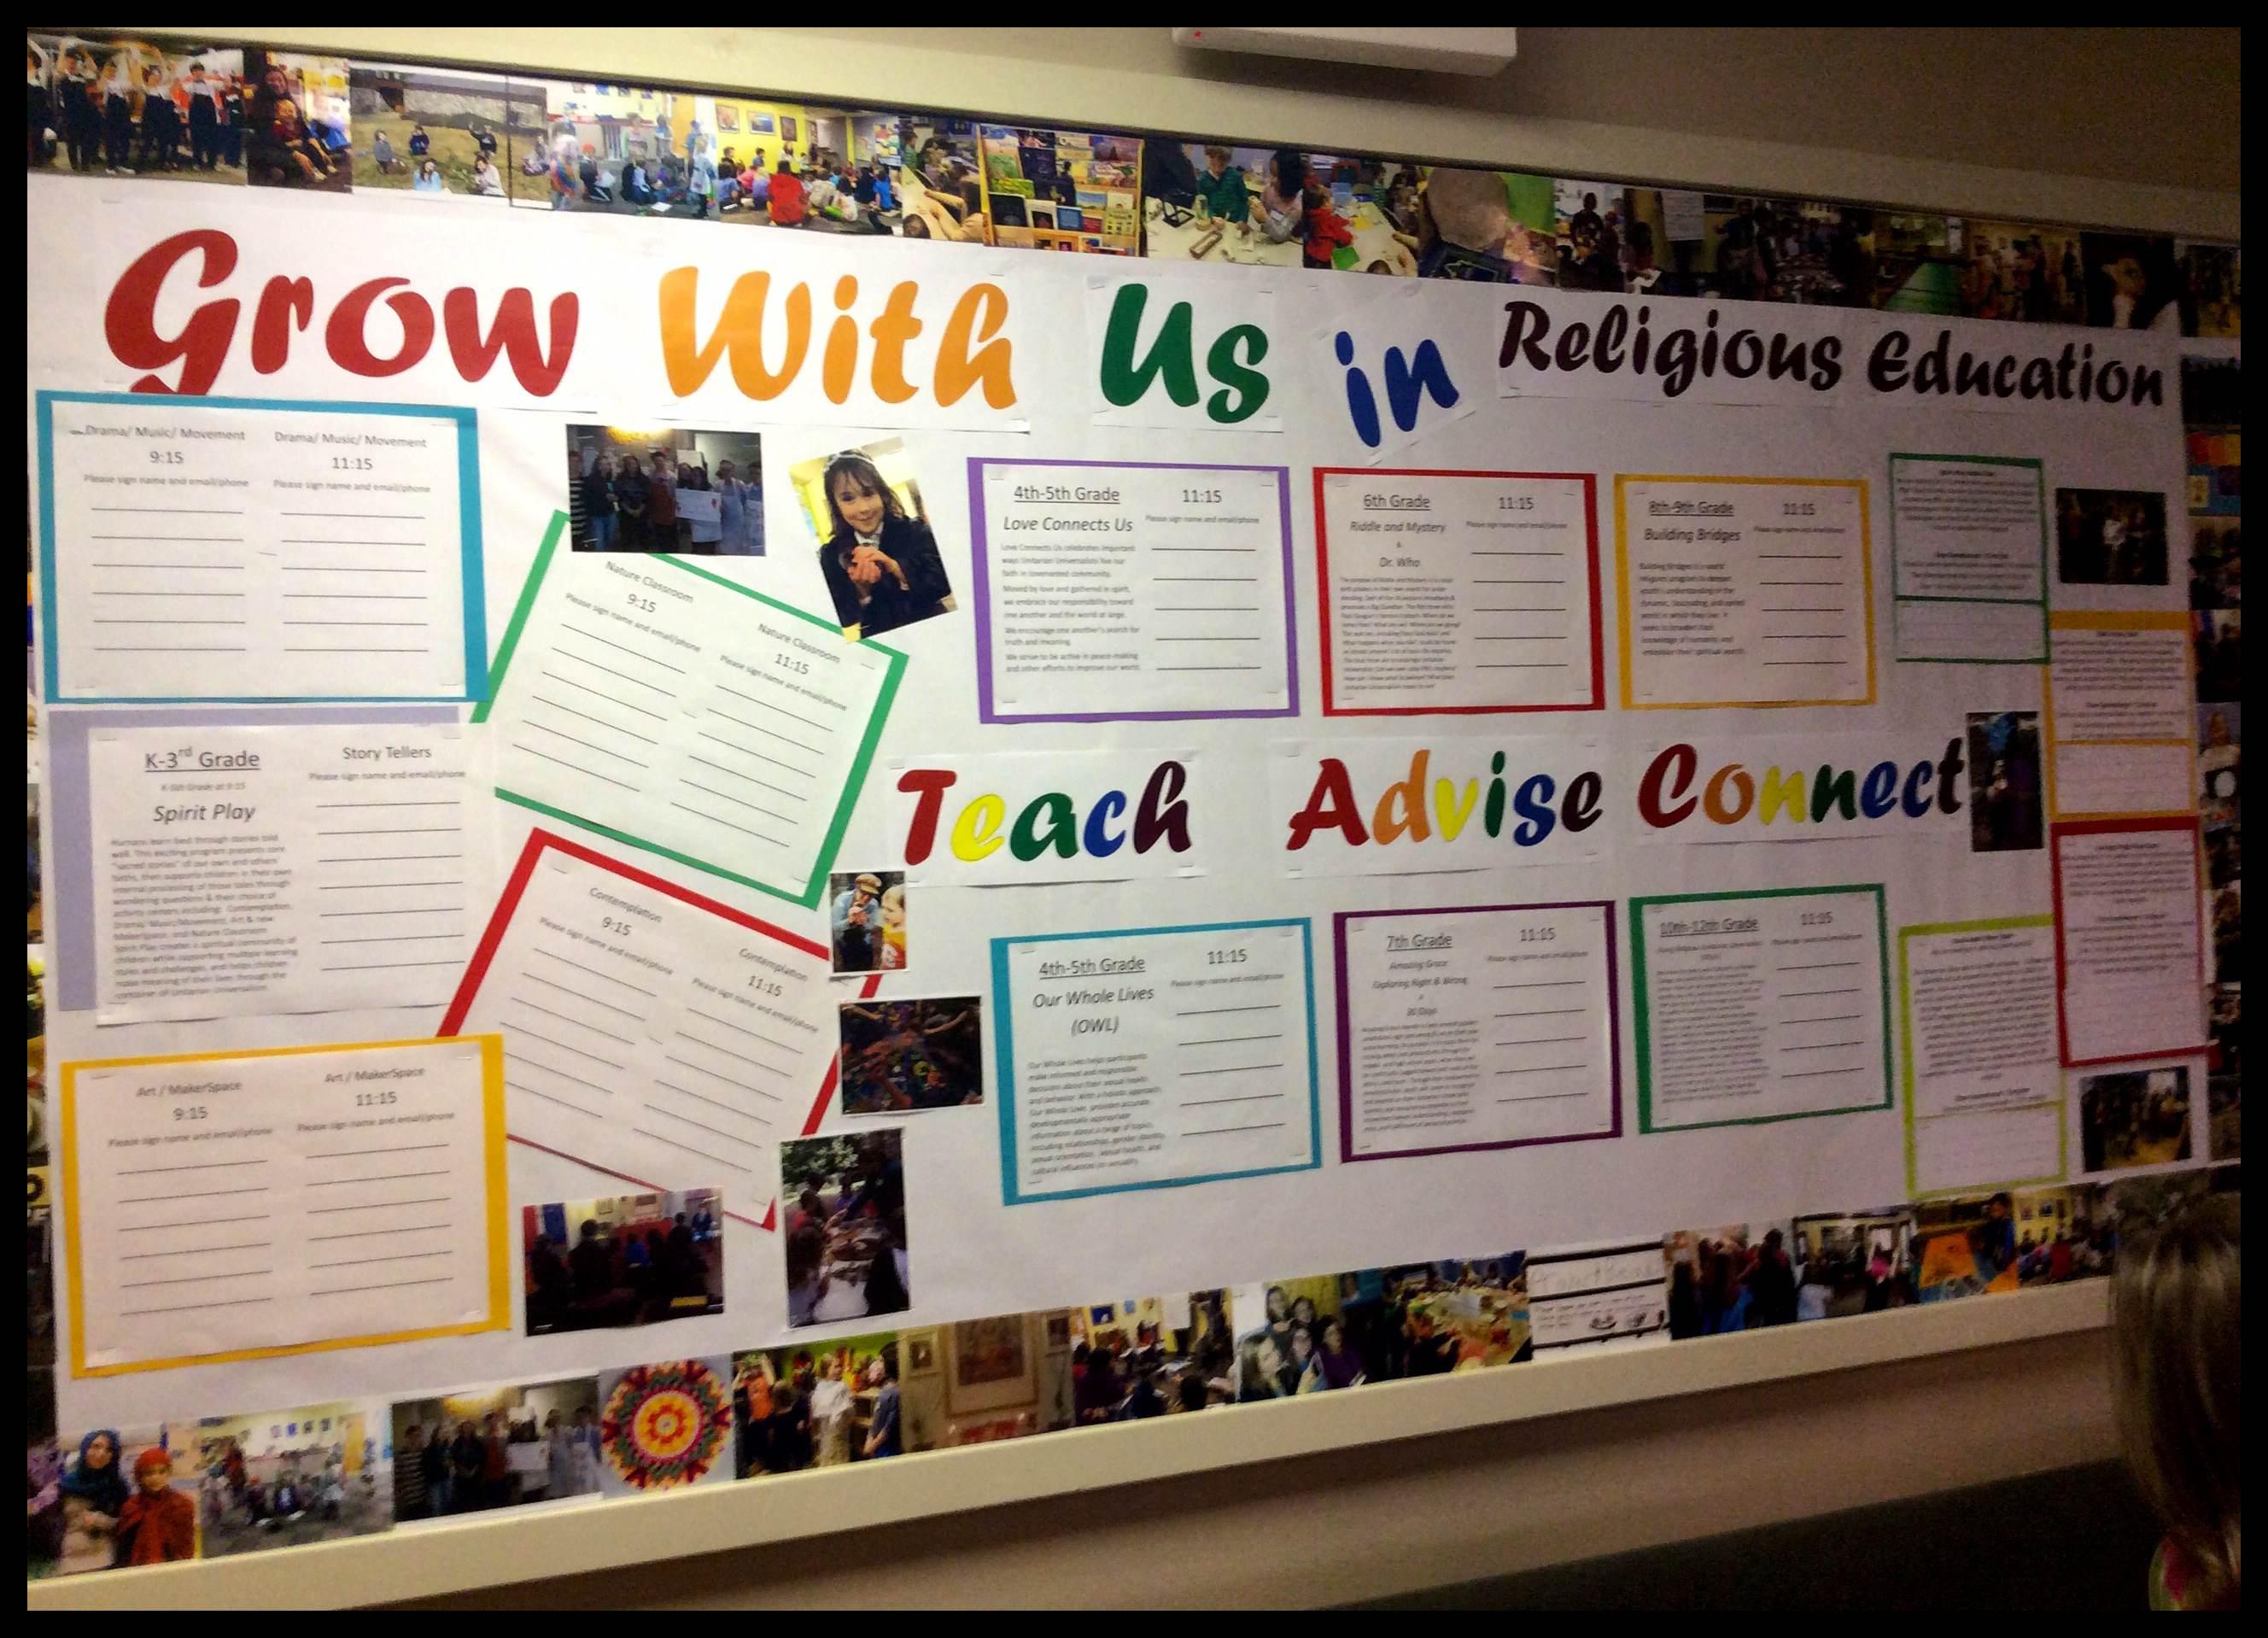 Teacher Training & Resources | UUA.org